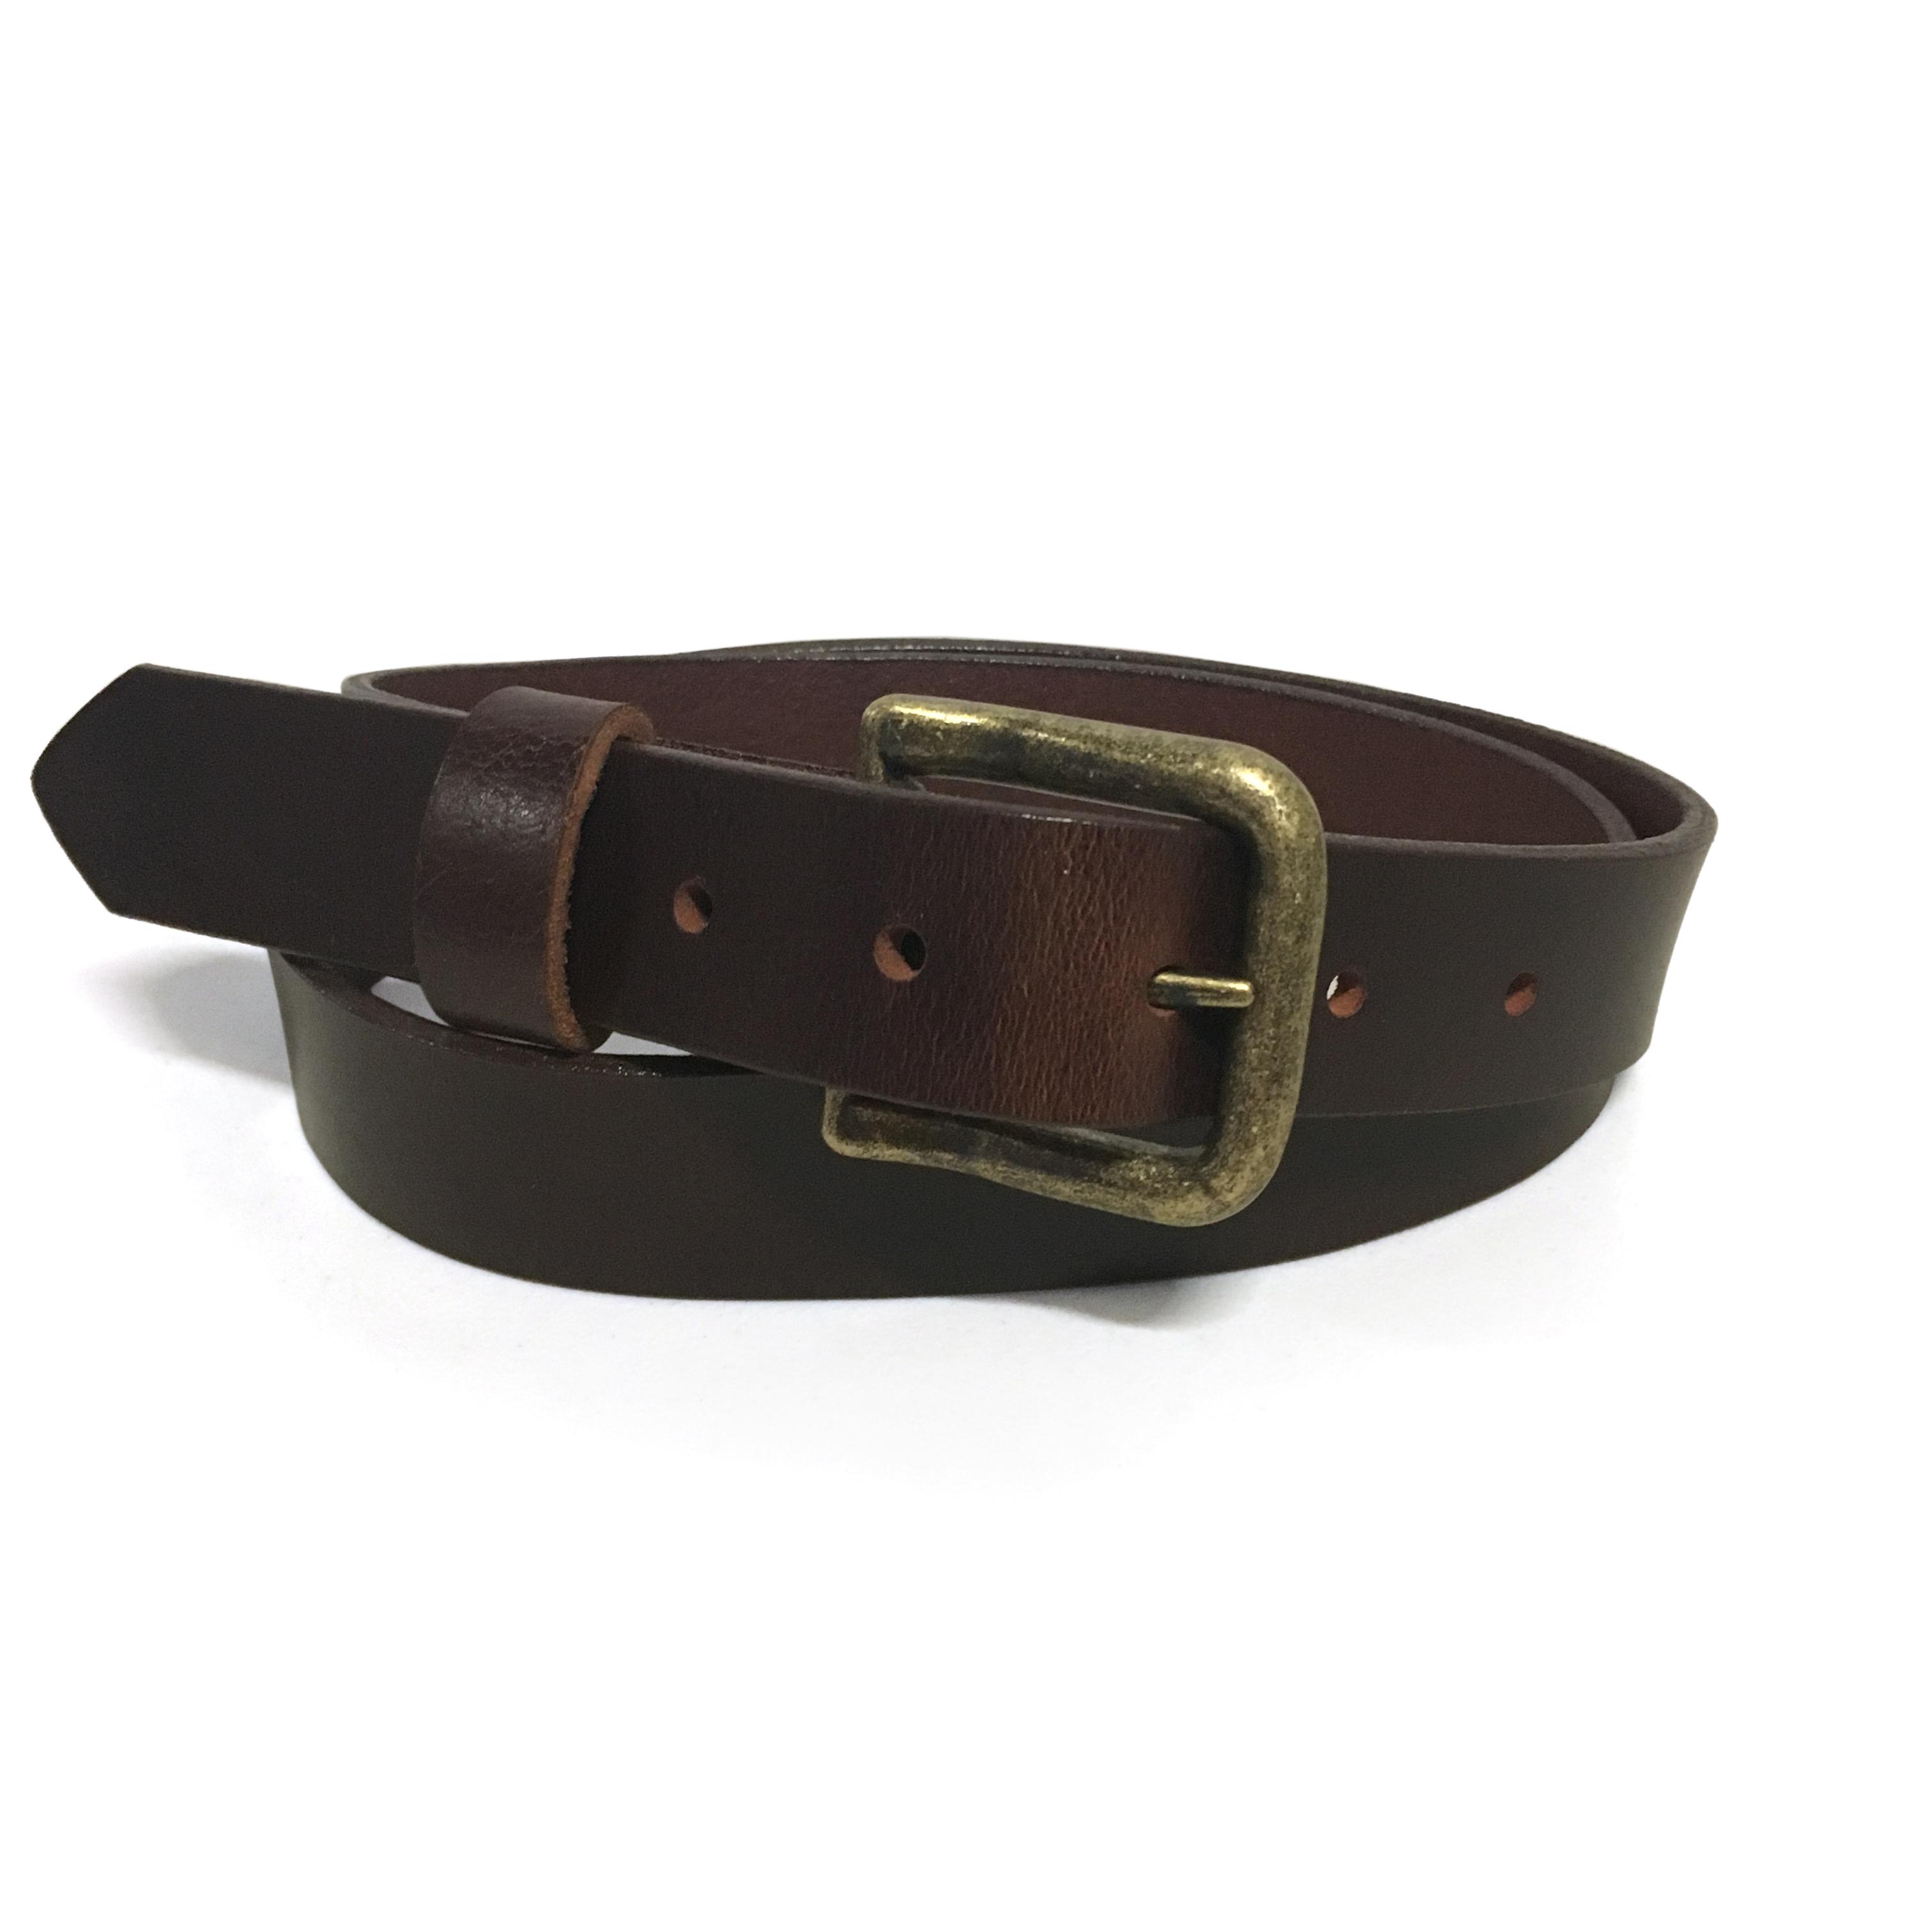 Handmade Full Grain Solid Leather Belts